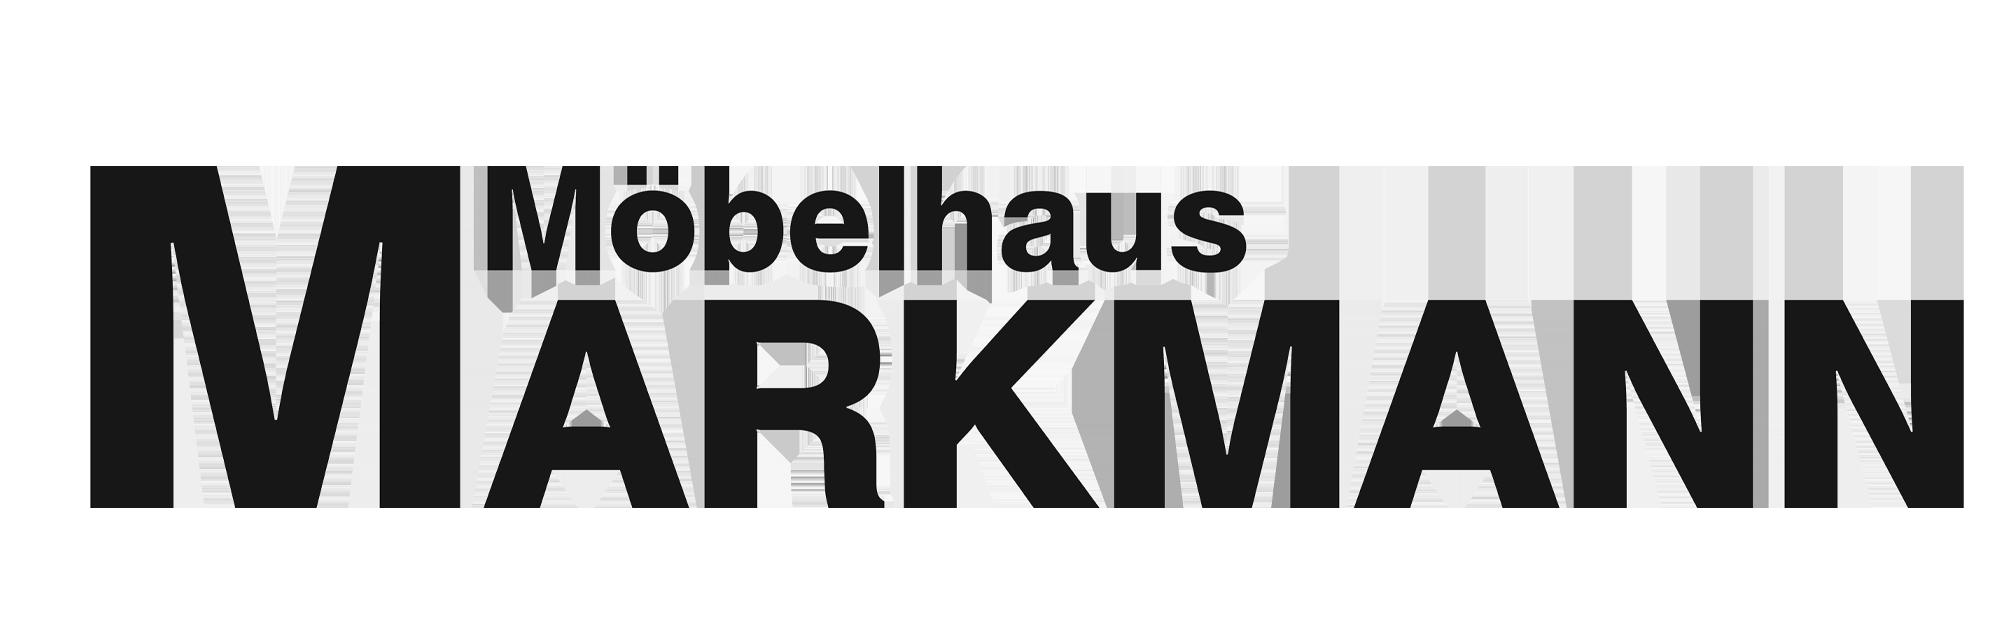 Möbelhaus Markmann GmbH